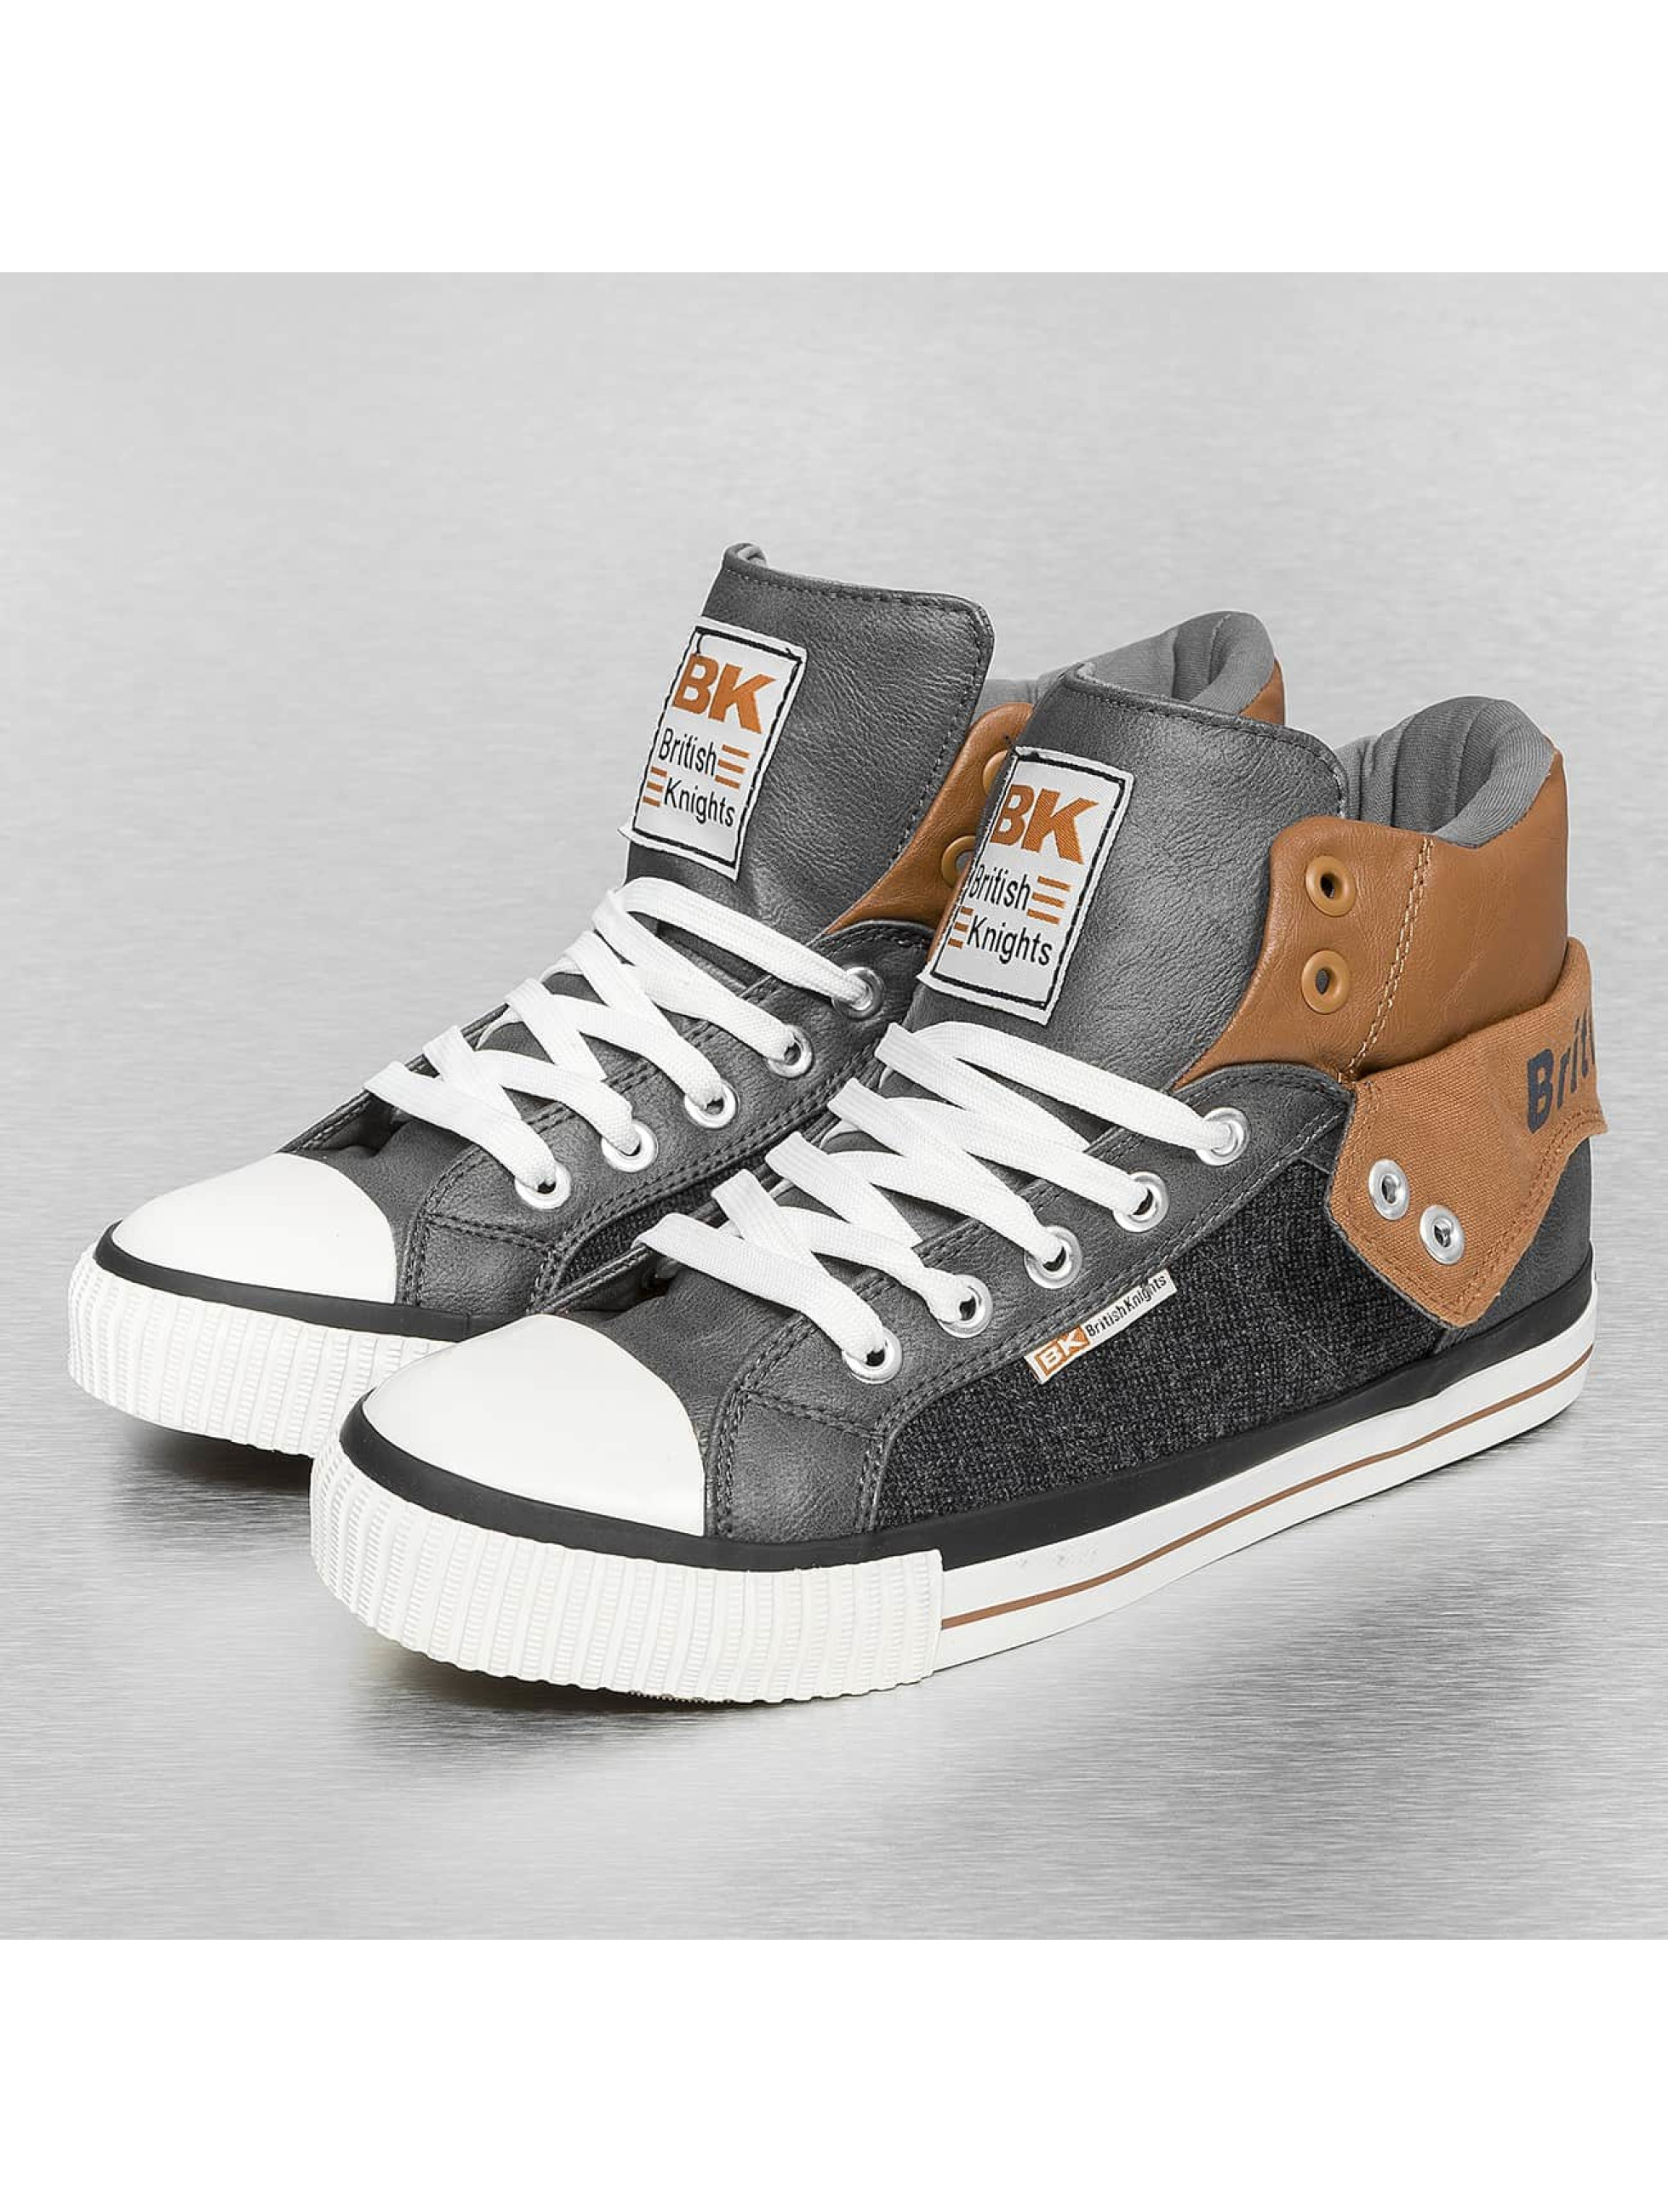 british knights schuhe sneaker roco tweed pu in grau. Black Bedroom Furniture Sets. Home Design Ideas